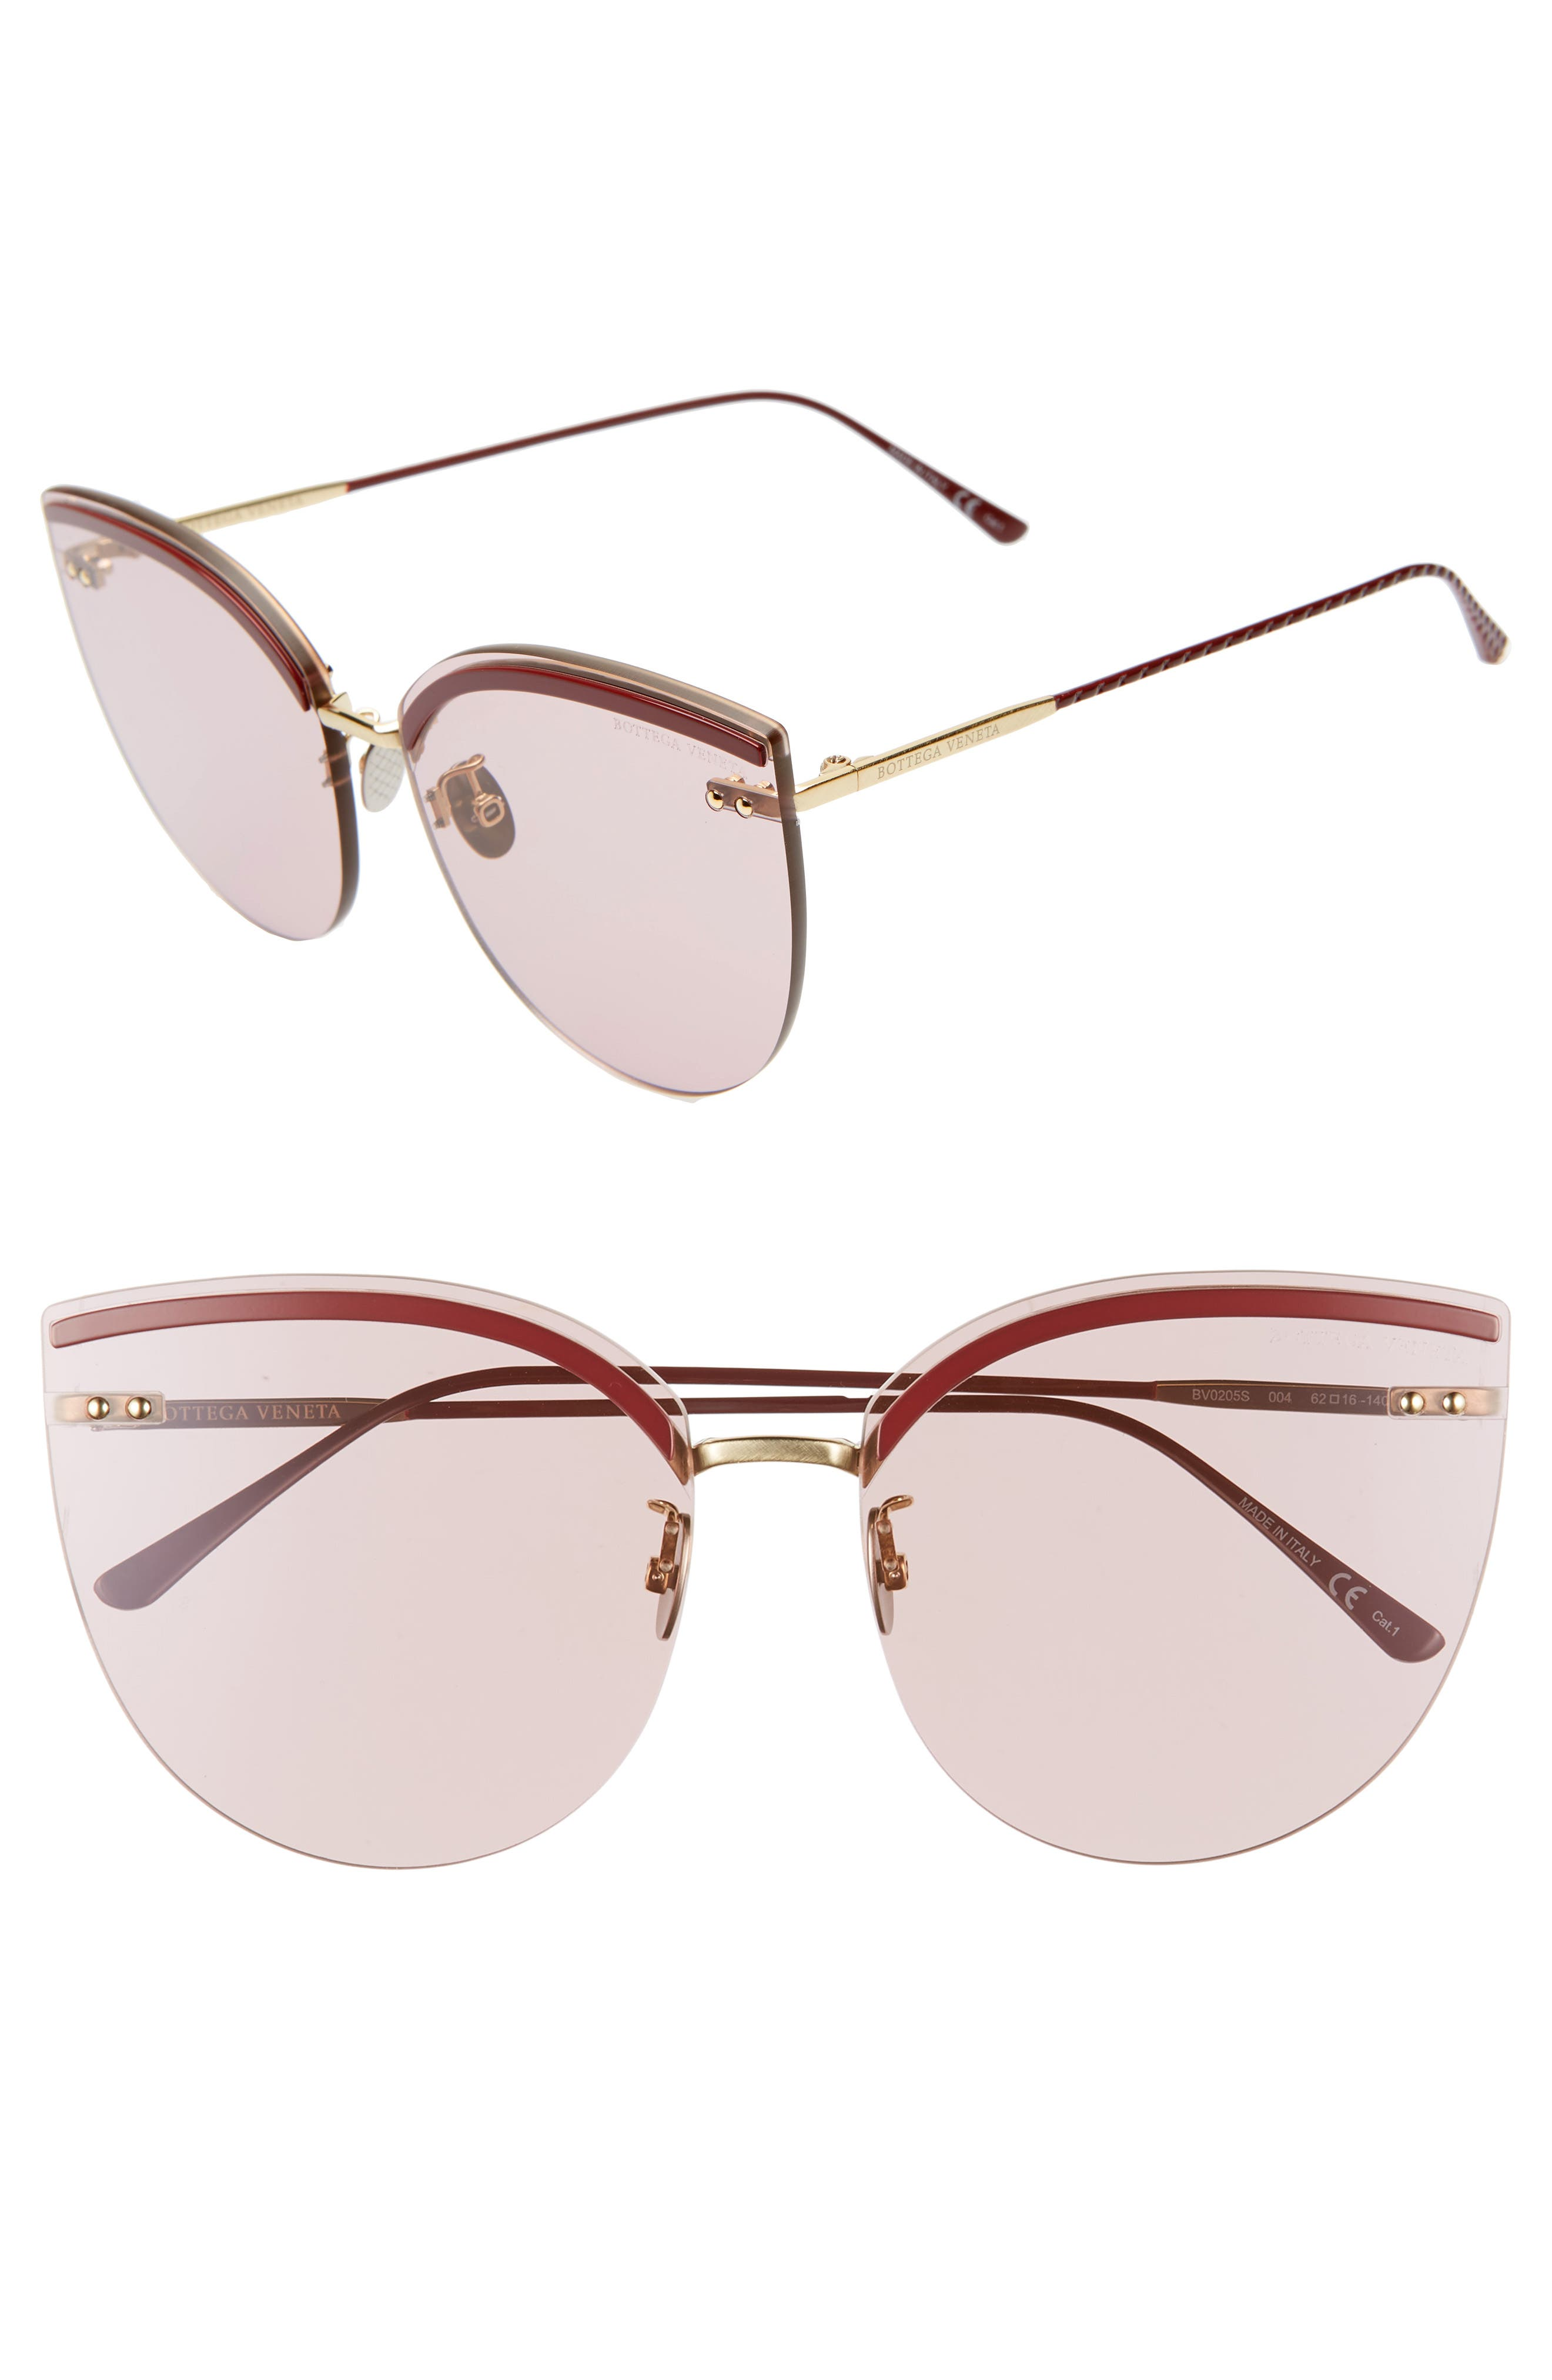 bab5726257 Women s Bottega Veneta Cat-Eye Sunglasses